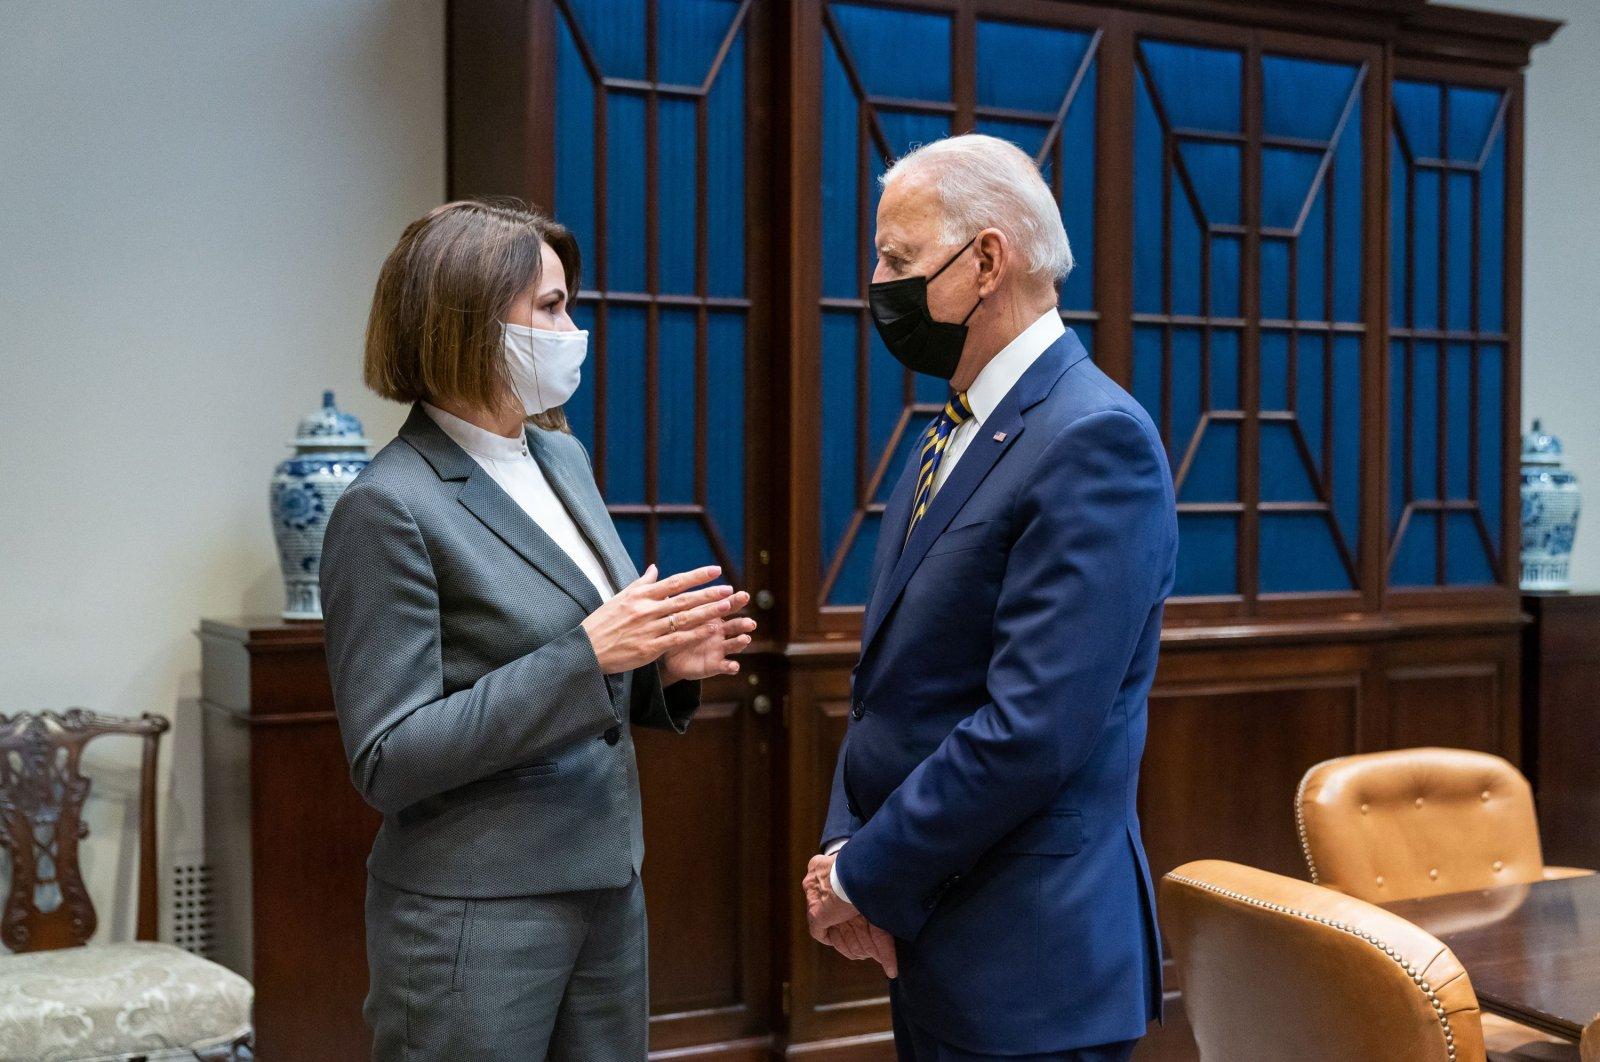 U.S. President Joe Biden meets with Belarus opposition leader Svetlana Tikhanovskaya at the White House in Washington, D.C., U.S., July 28, 2021. (AFP Photo/The White House)